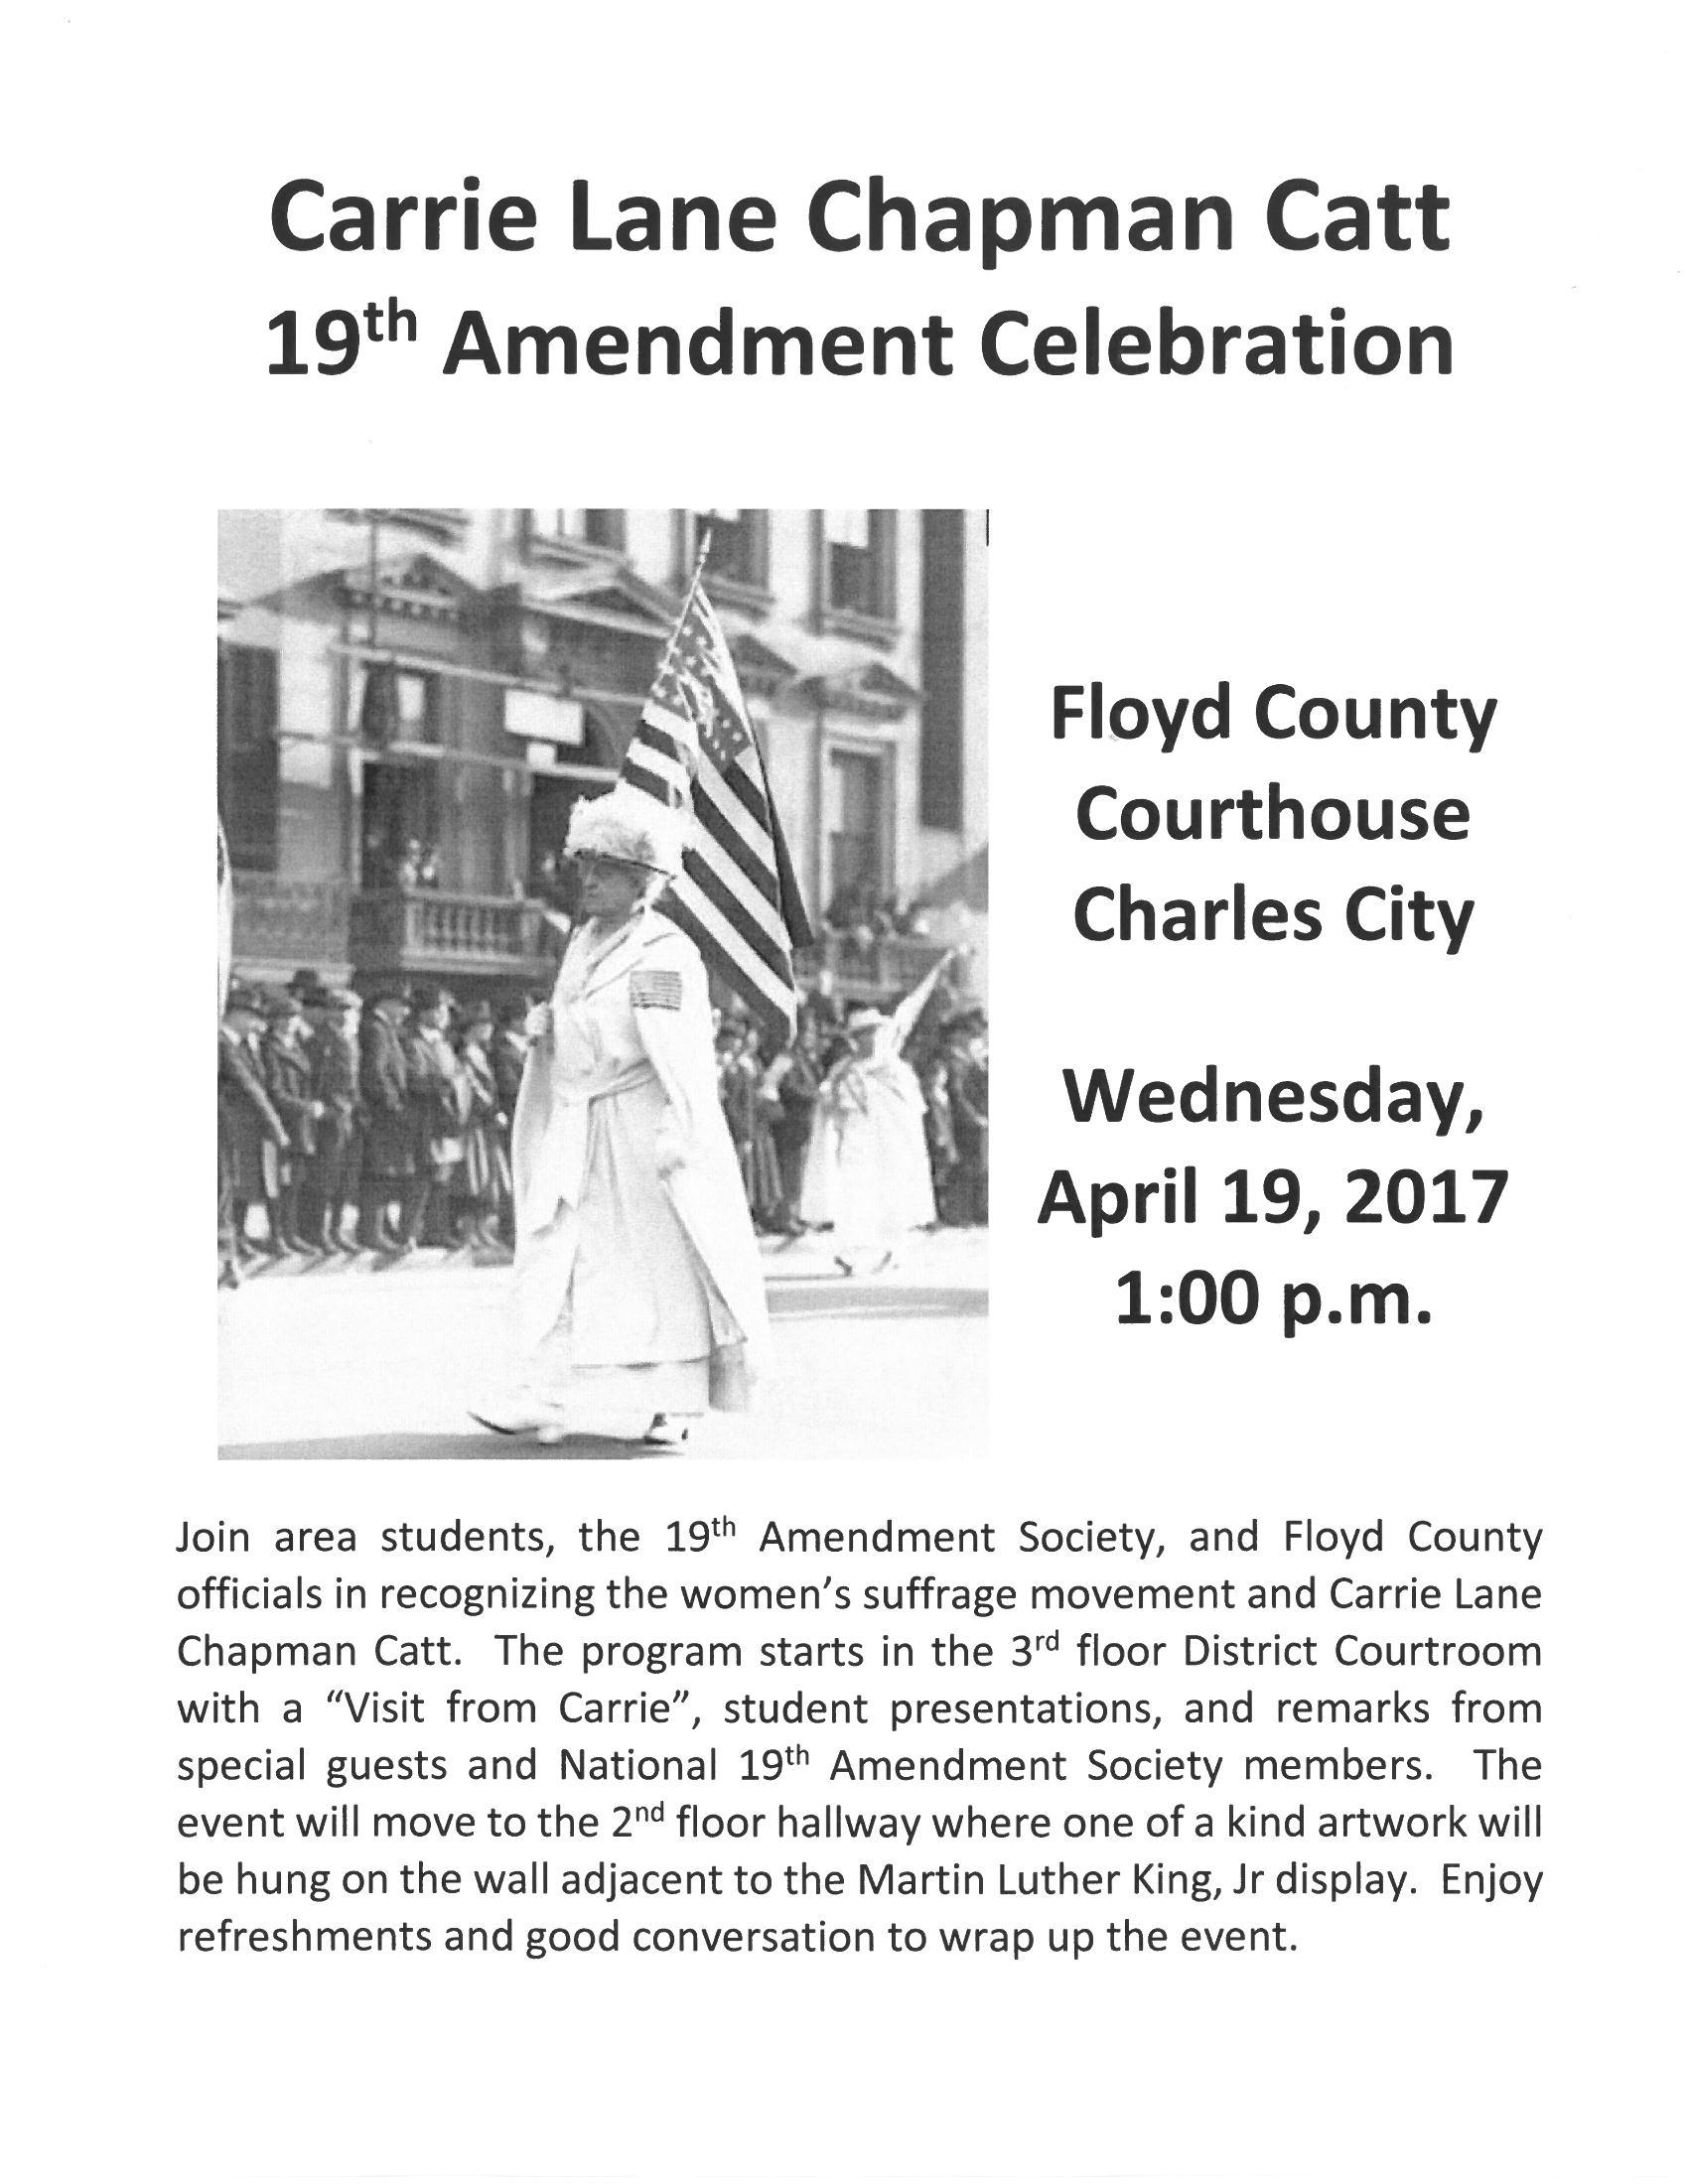 Floyd County, Ia - Official Website For Lane County Trial Calendar